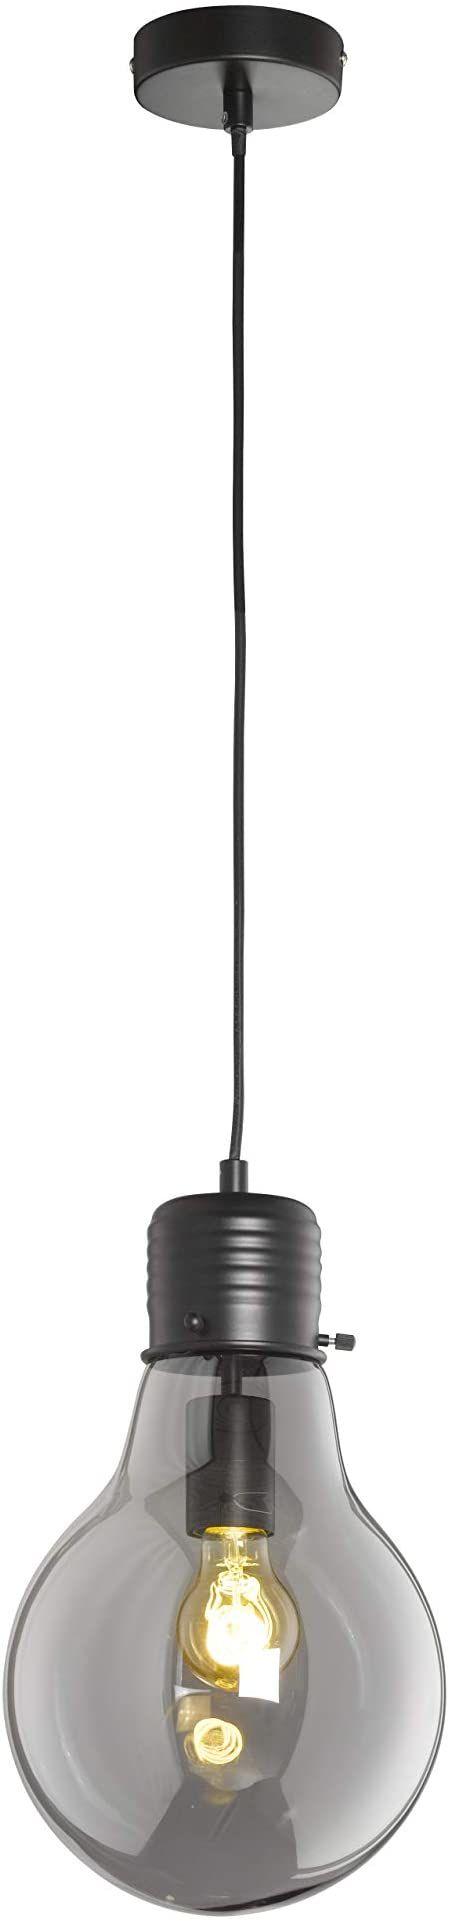 Fischer&Honsel Louis lampa wisząca, metal, 40 W, czarna